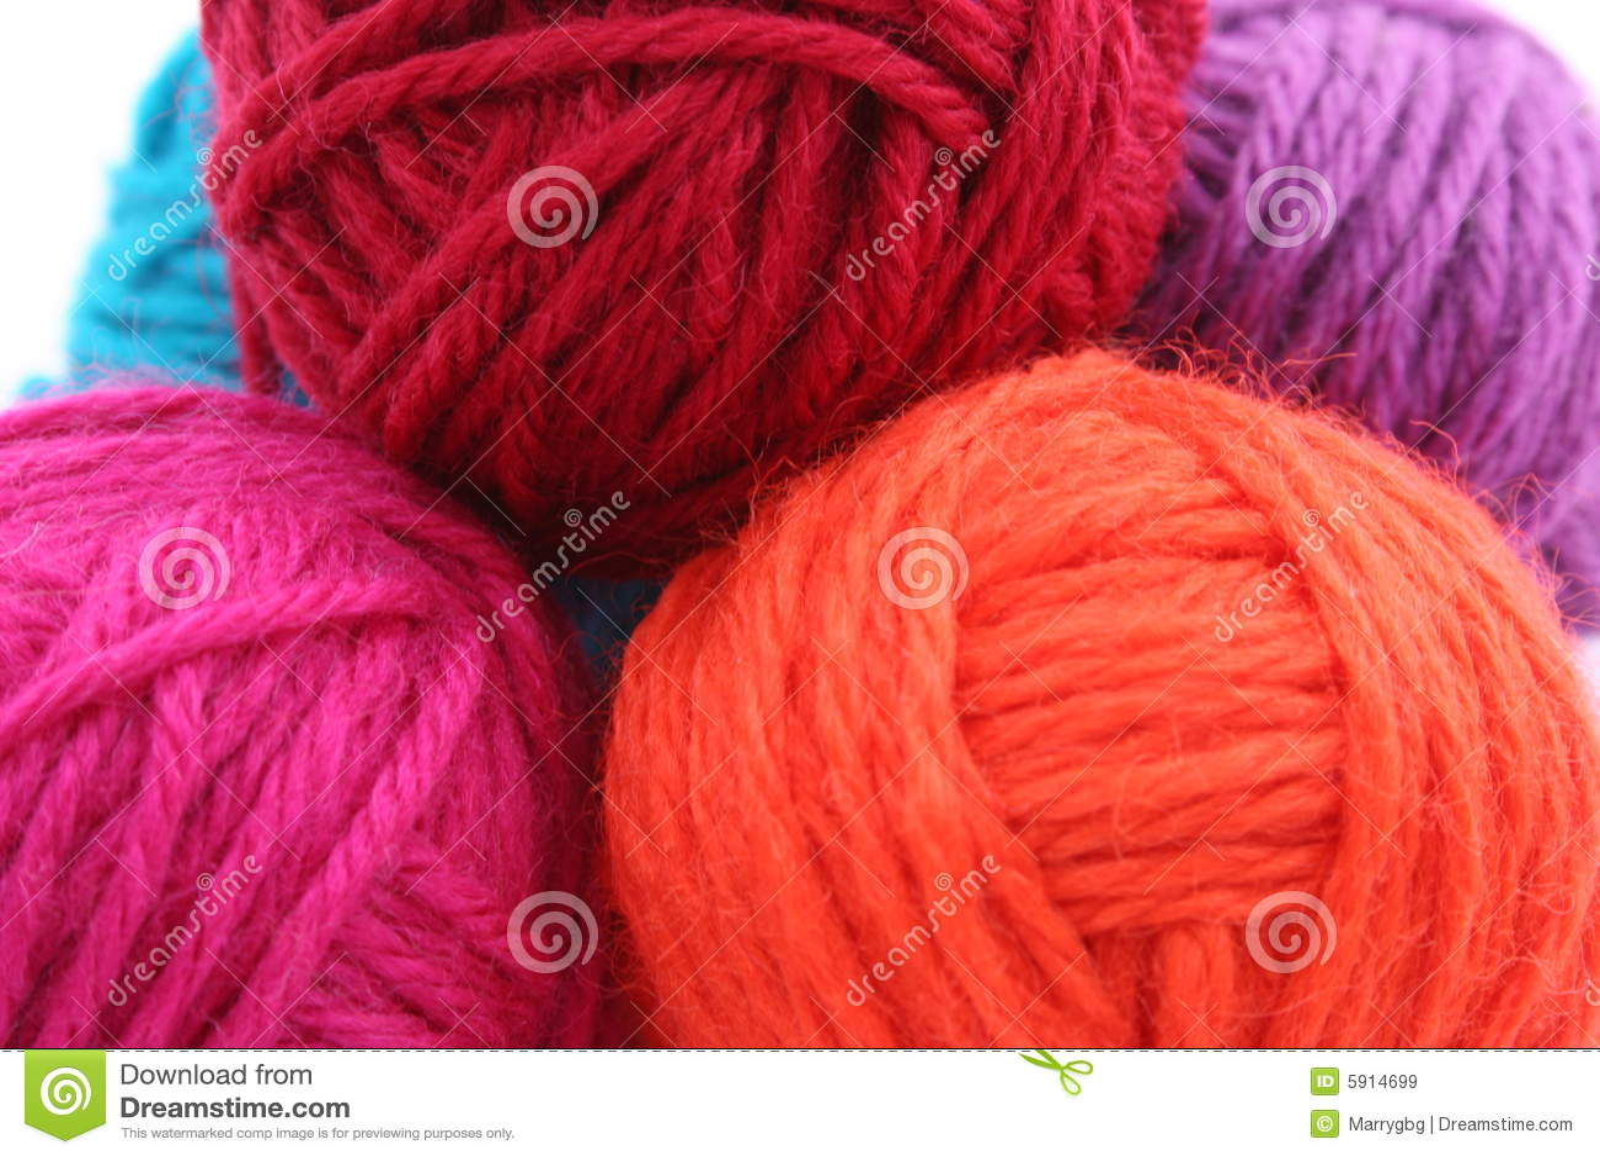 Yarn business plan